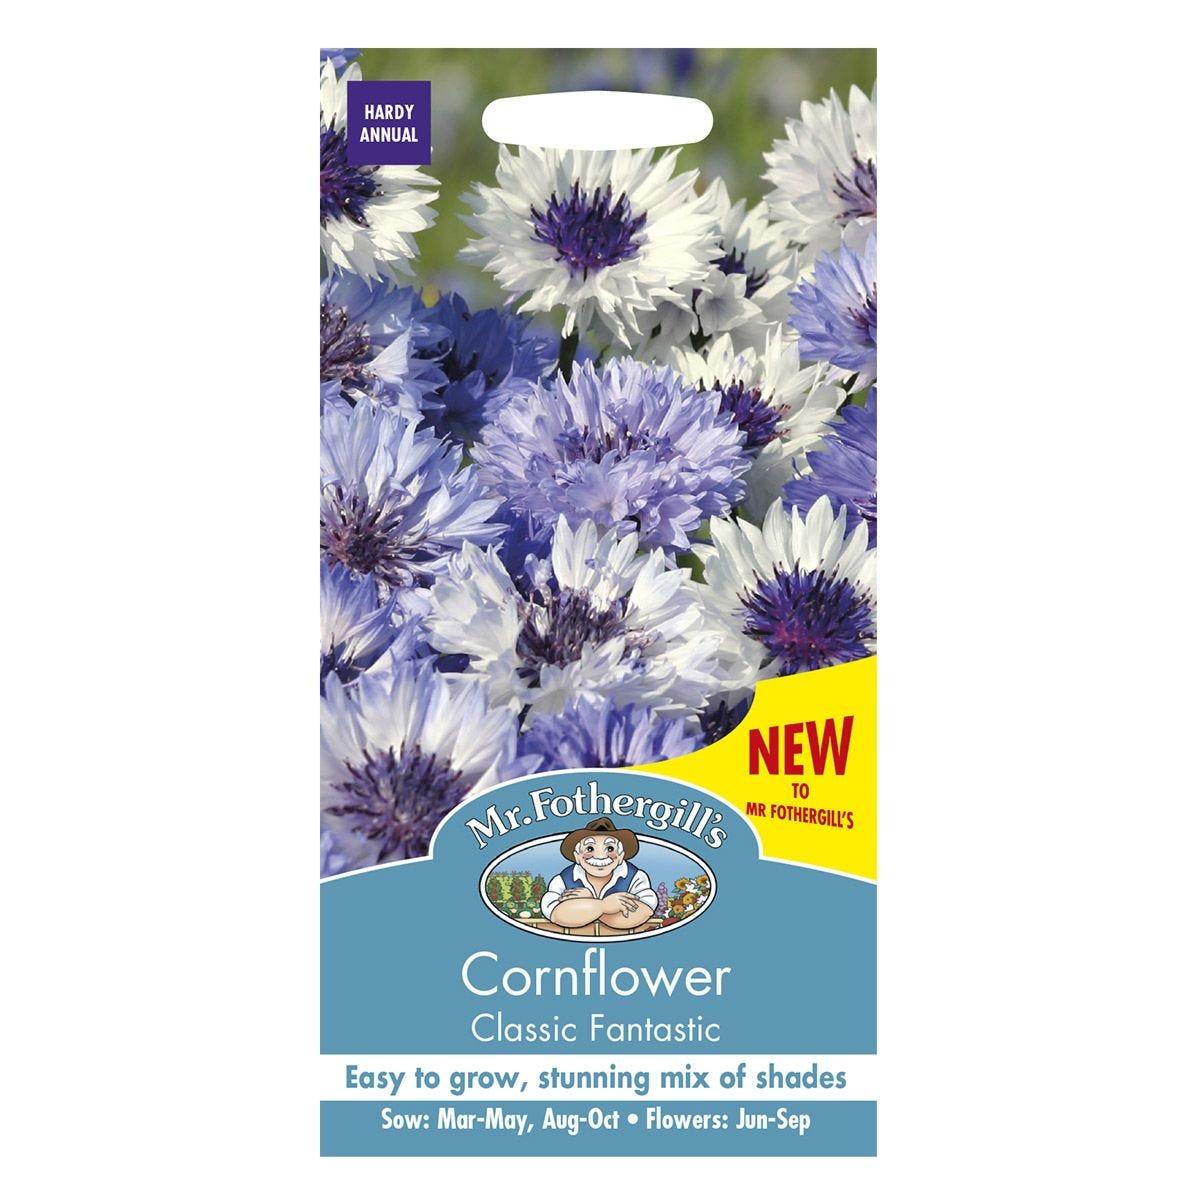 Mr Fothergill's Cornflower Classic Fantastic Seeds